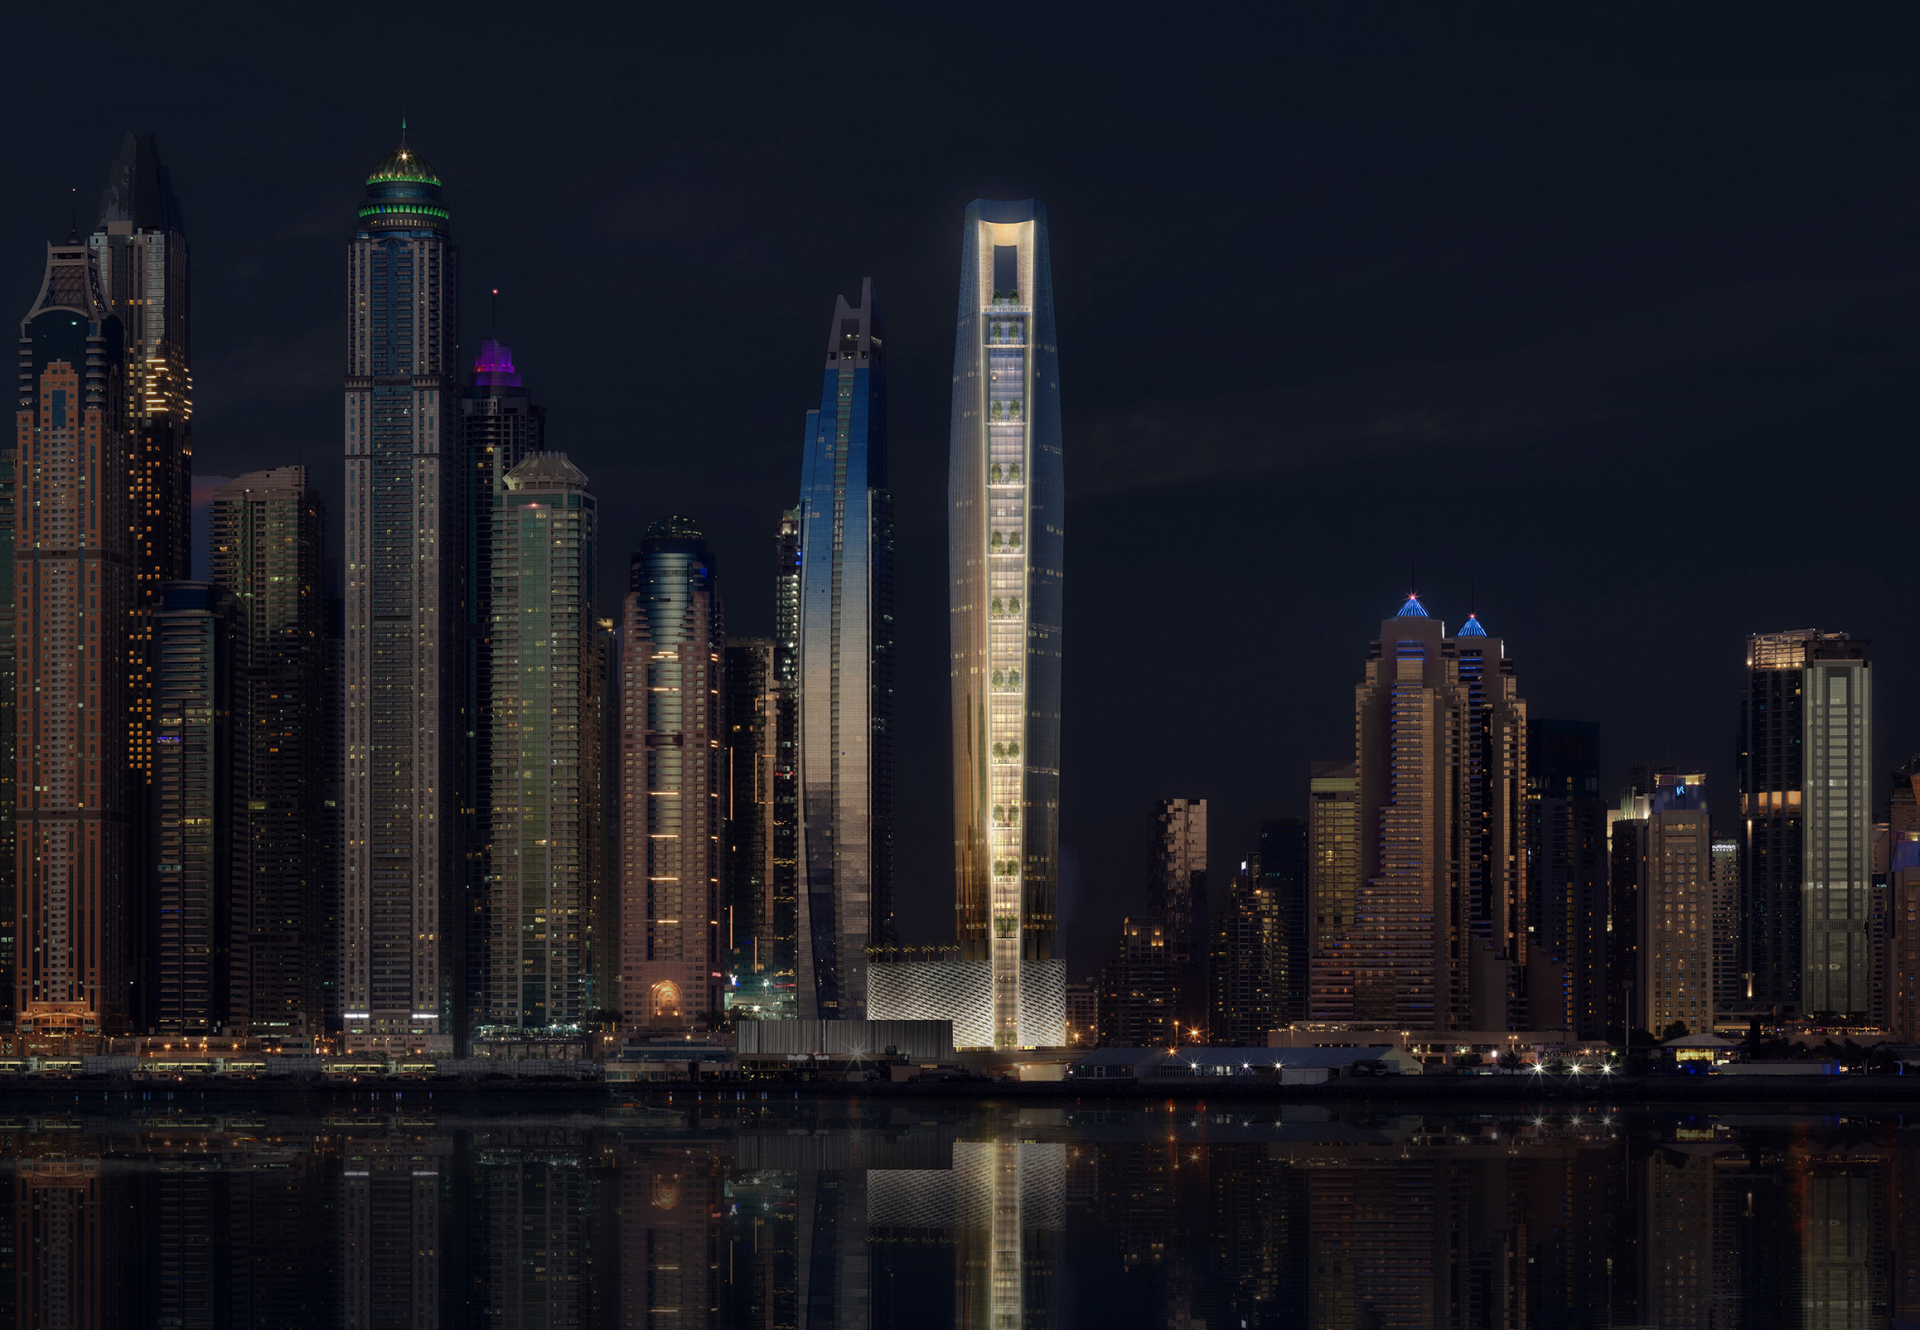 Ciel Hotel, Dubai Marina Set To Be The World's Tallest Hotel